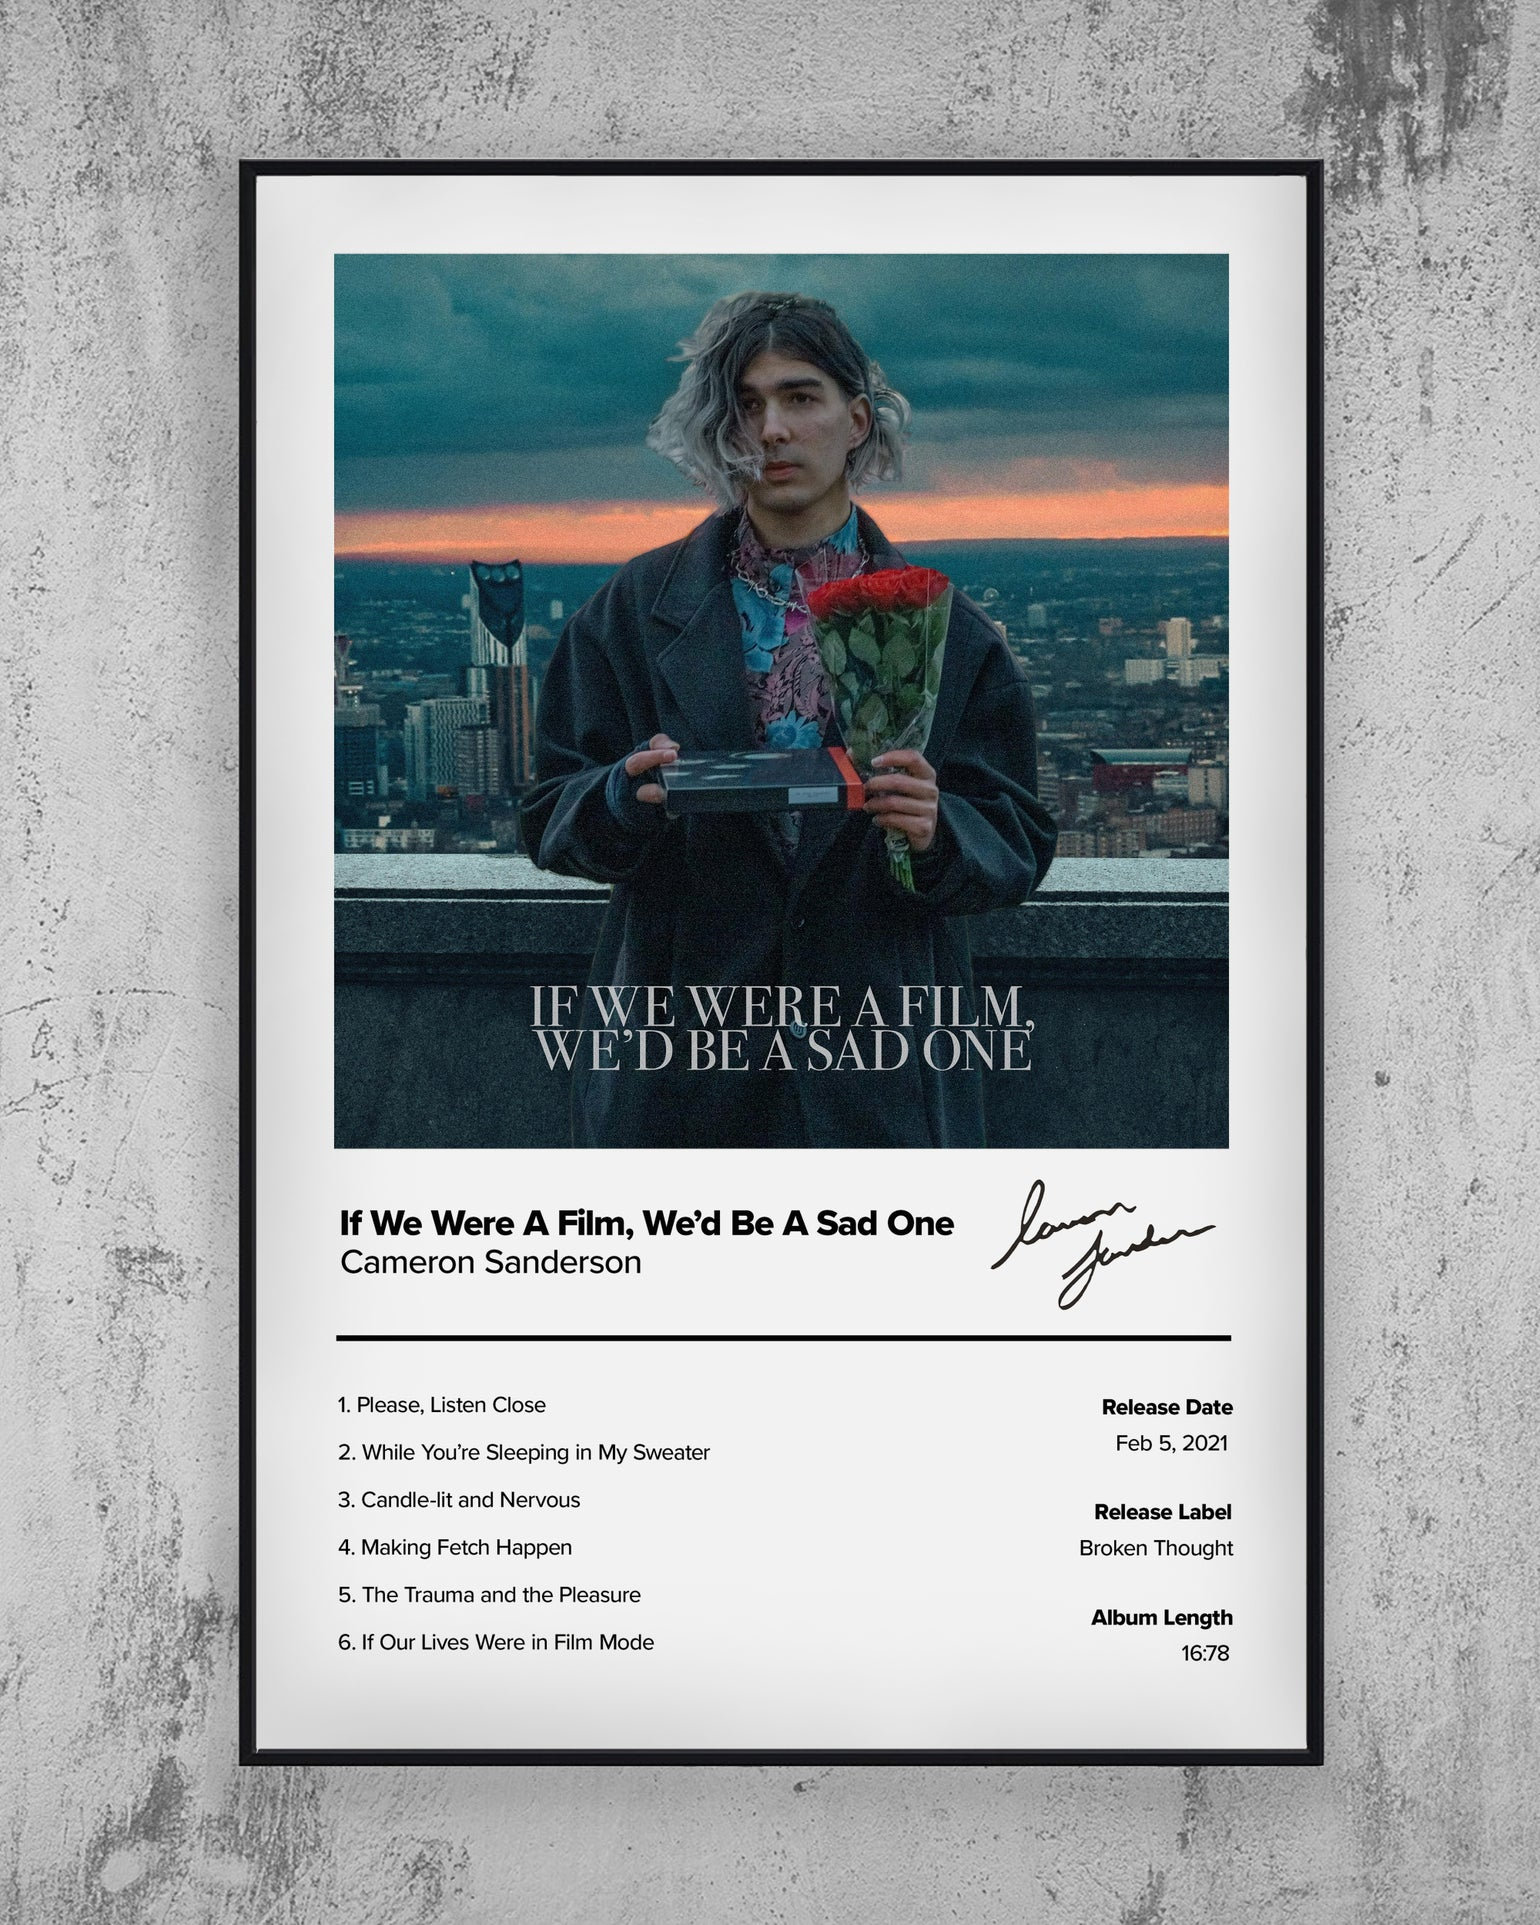 Image of 'If We Were A Film, We'd Be a Sad One' Signed Print